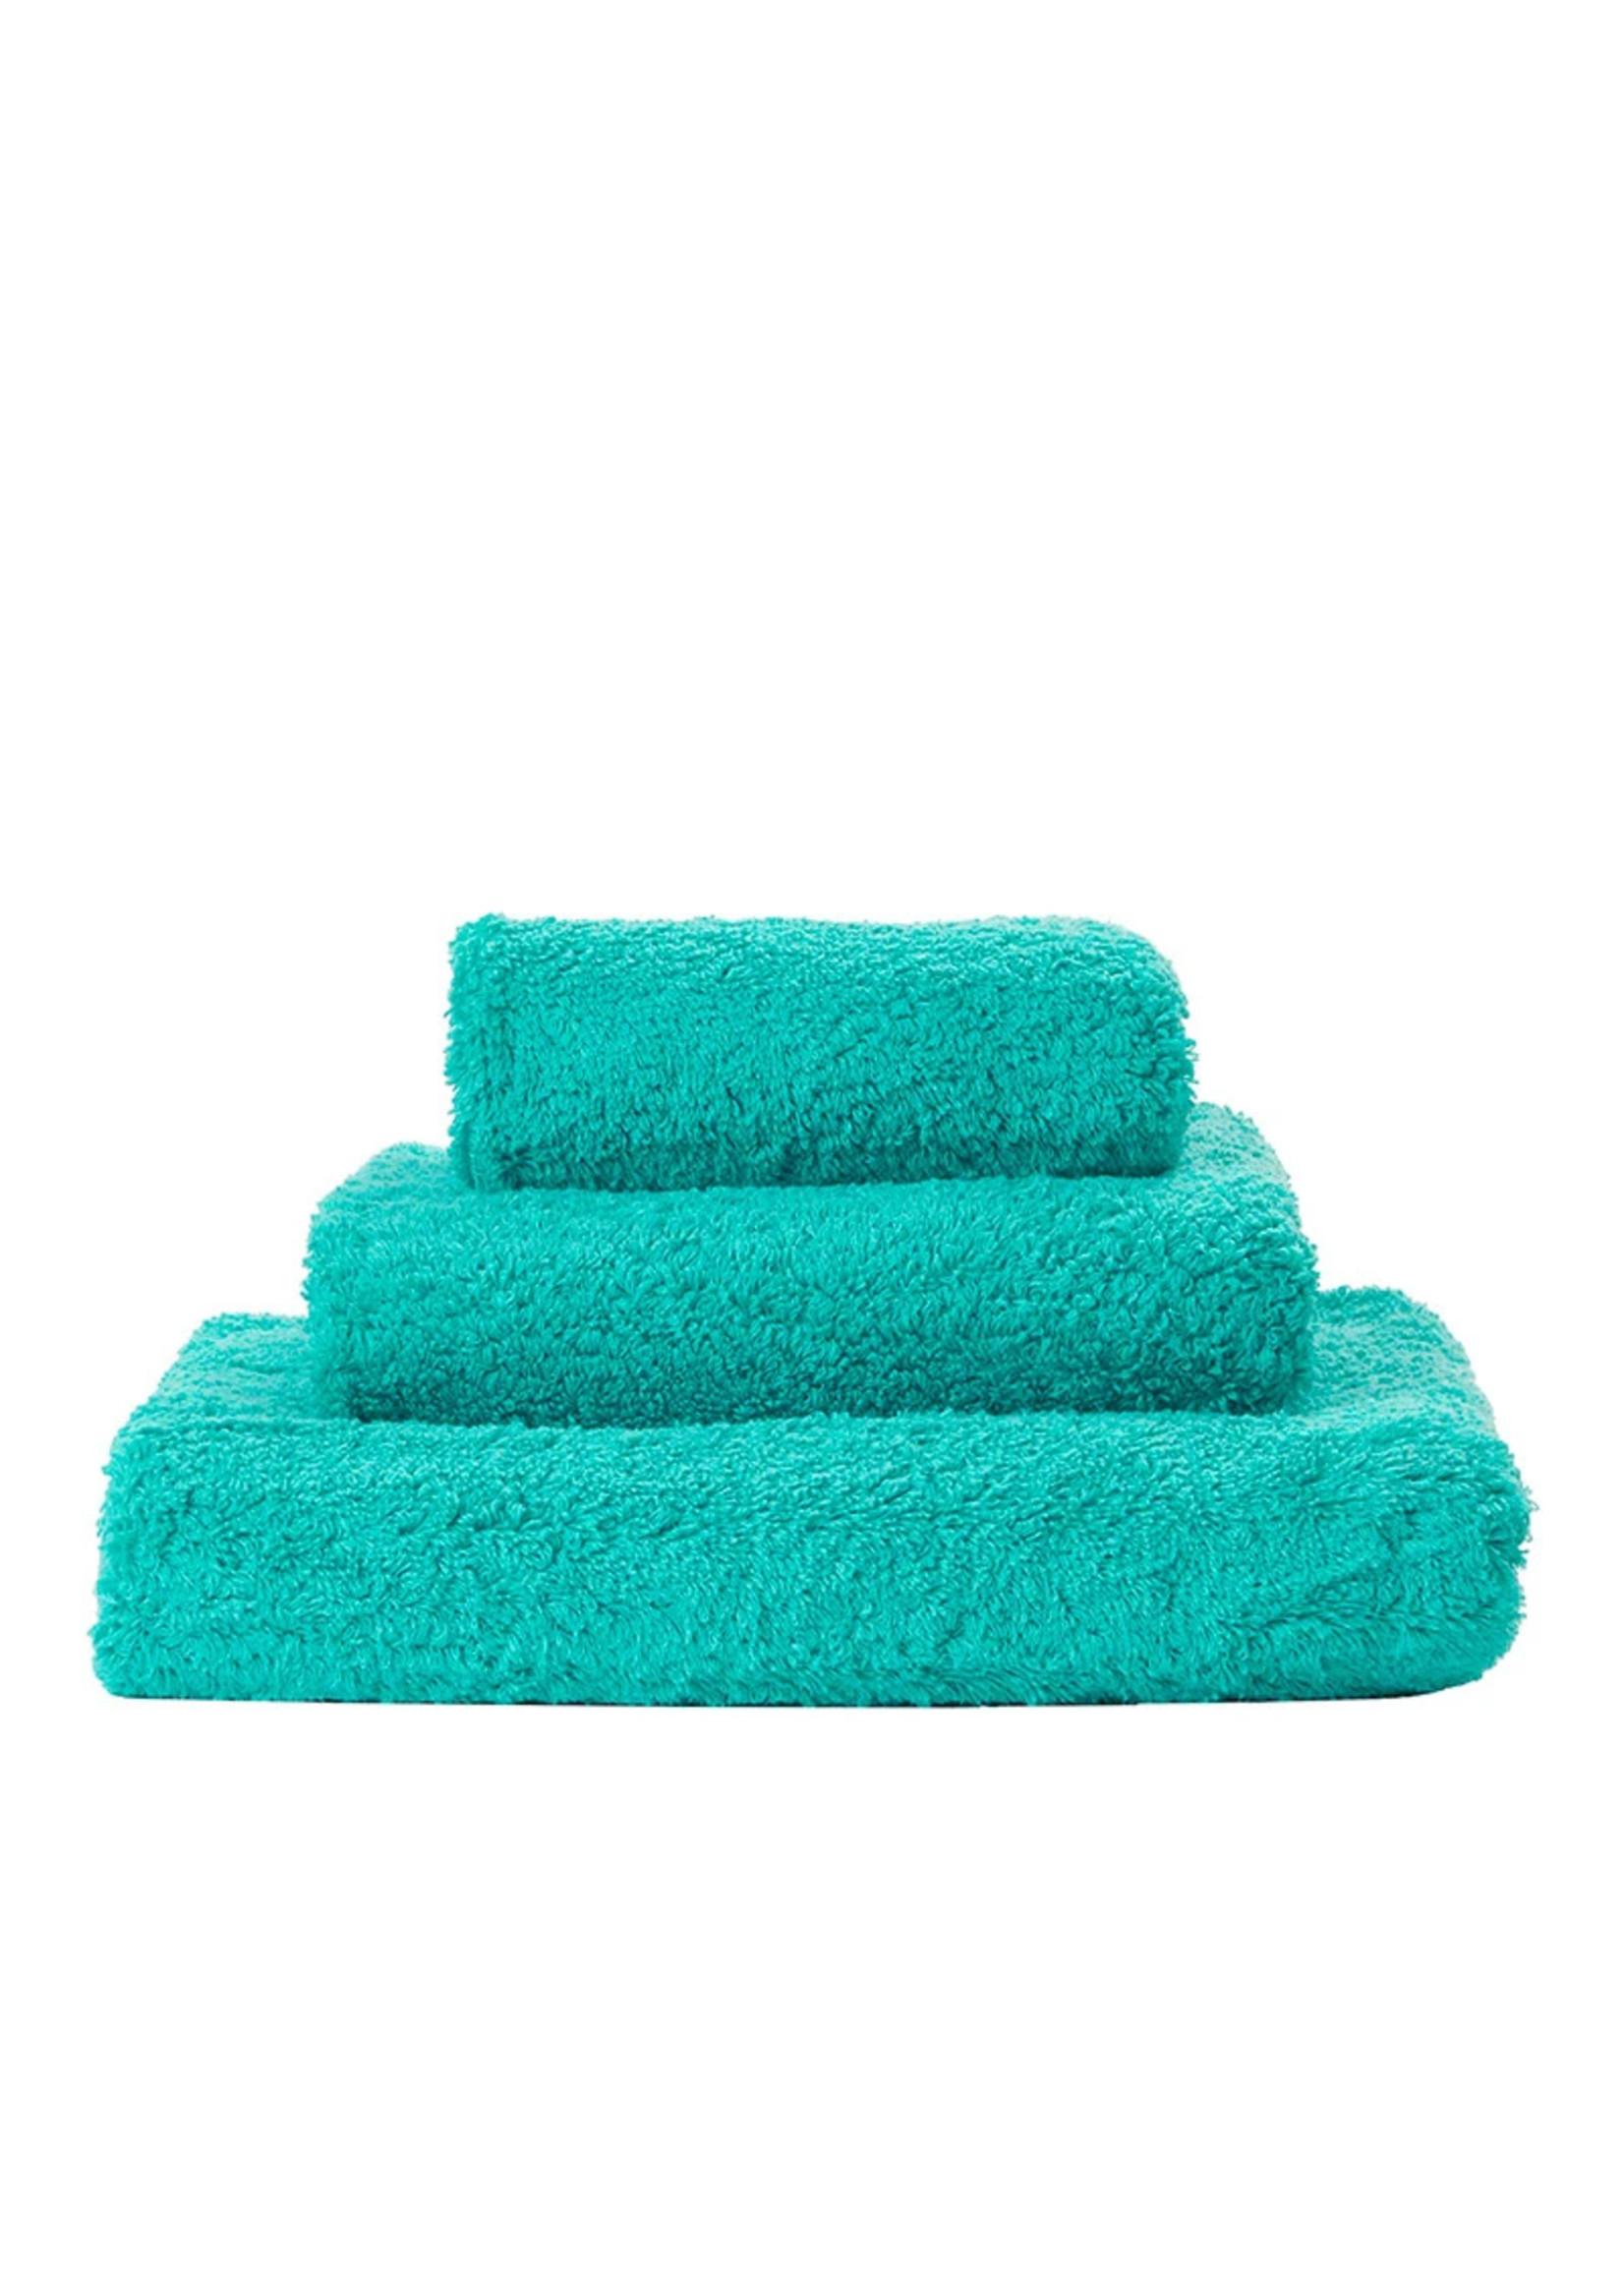 Abyss & Habidecor Super Pile Lagoon Towels